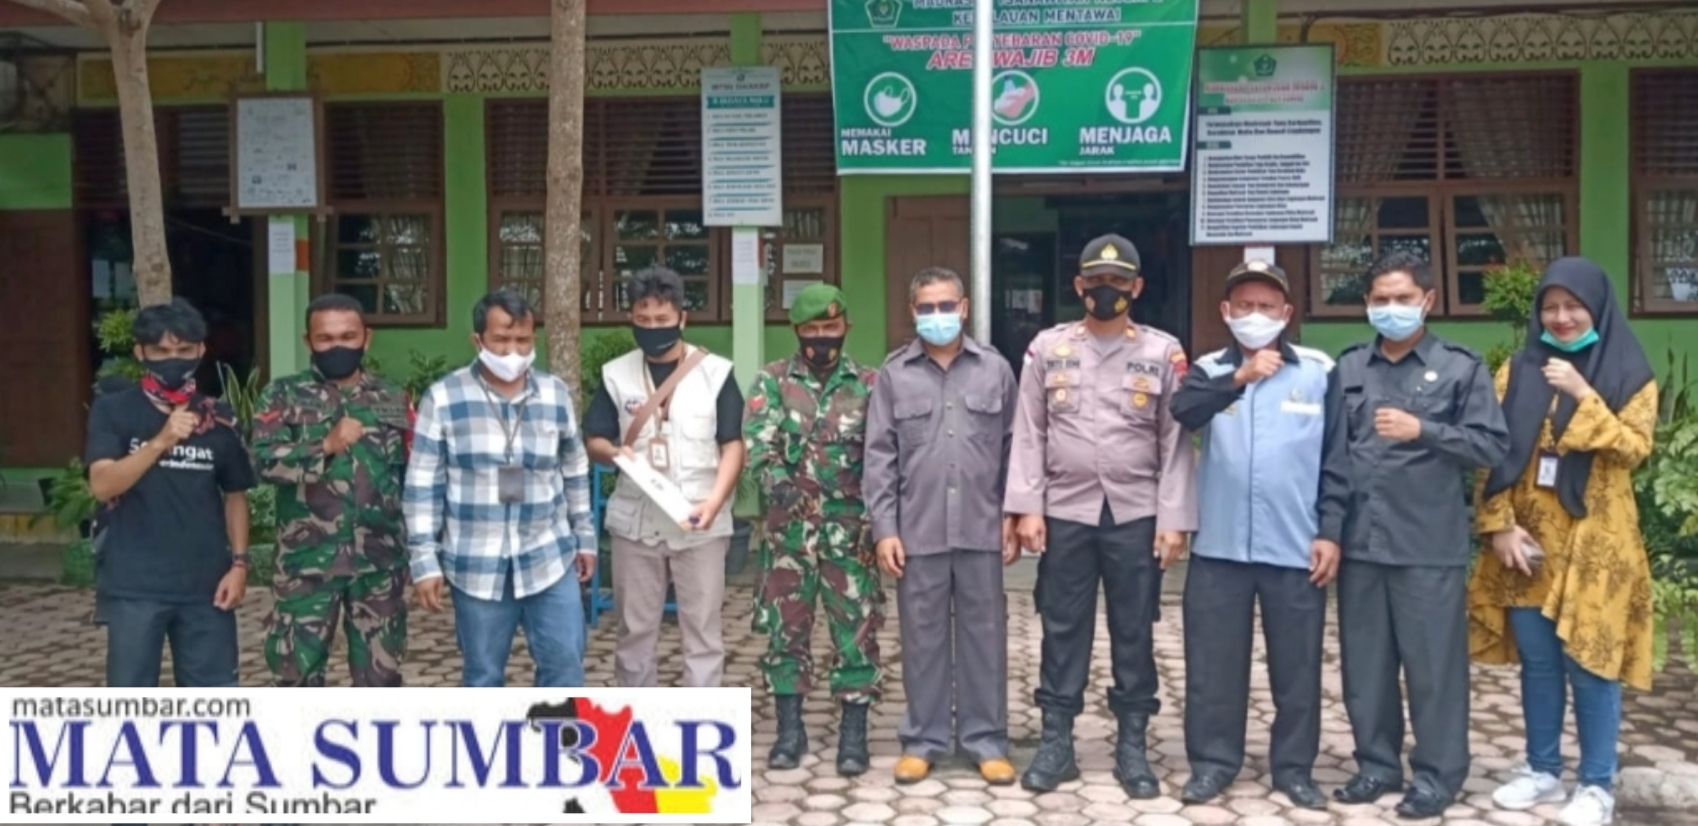 Babinramil Sikakap Dampingi Penyerahaan Bantuan Sarana Pendidikan dari YBM BRI di Sekolah Madrasah